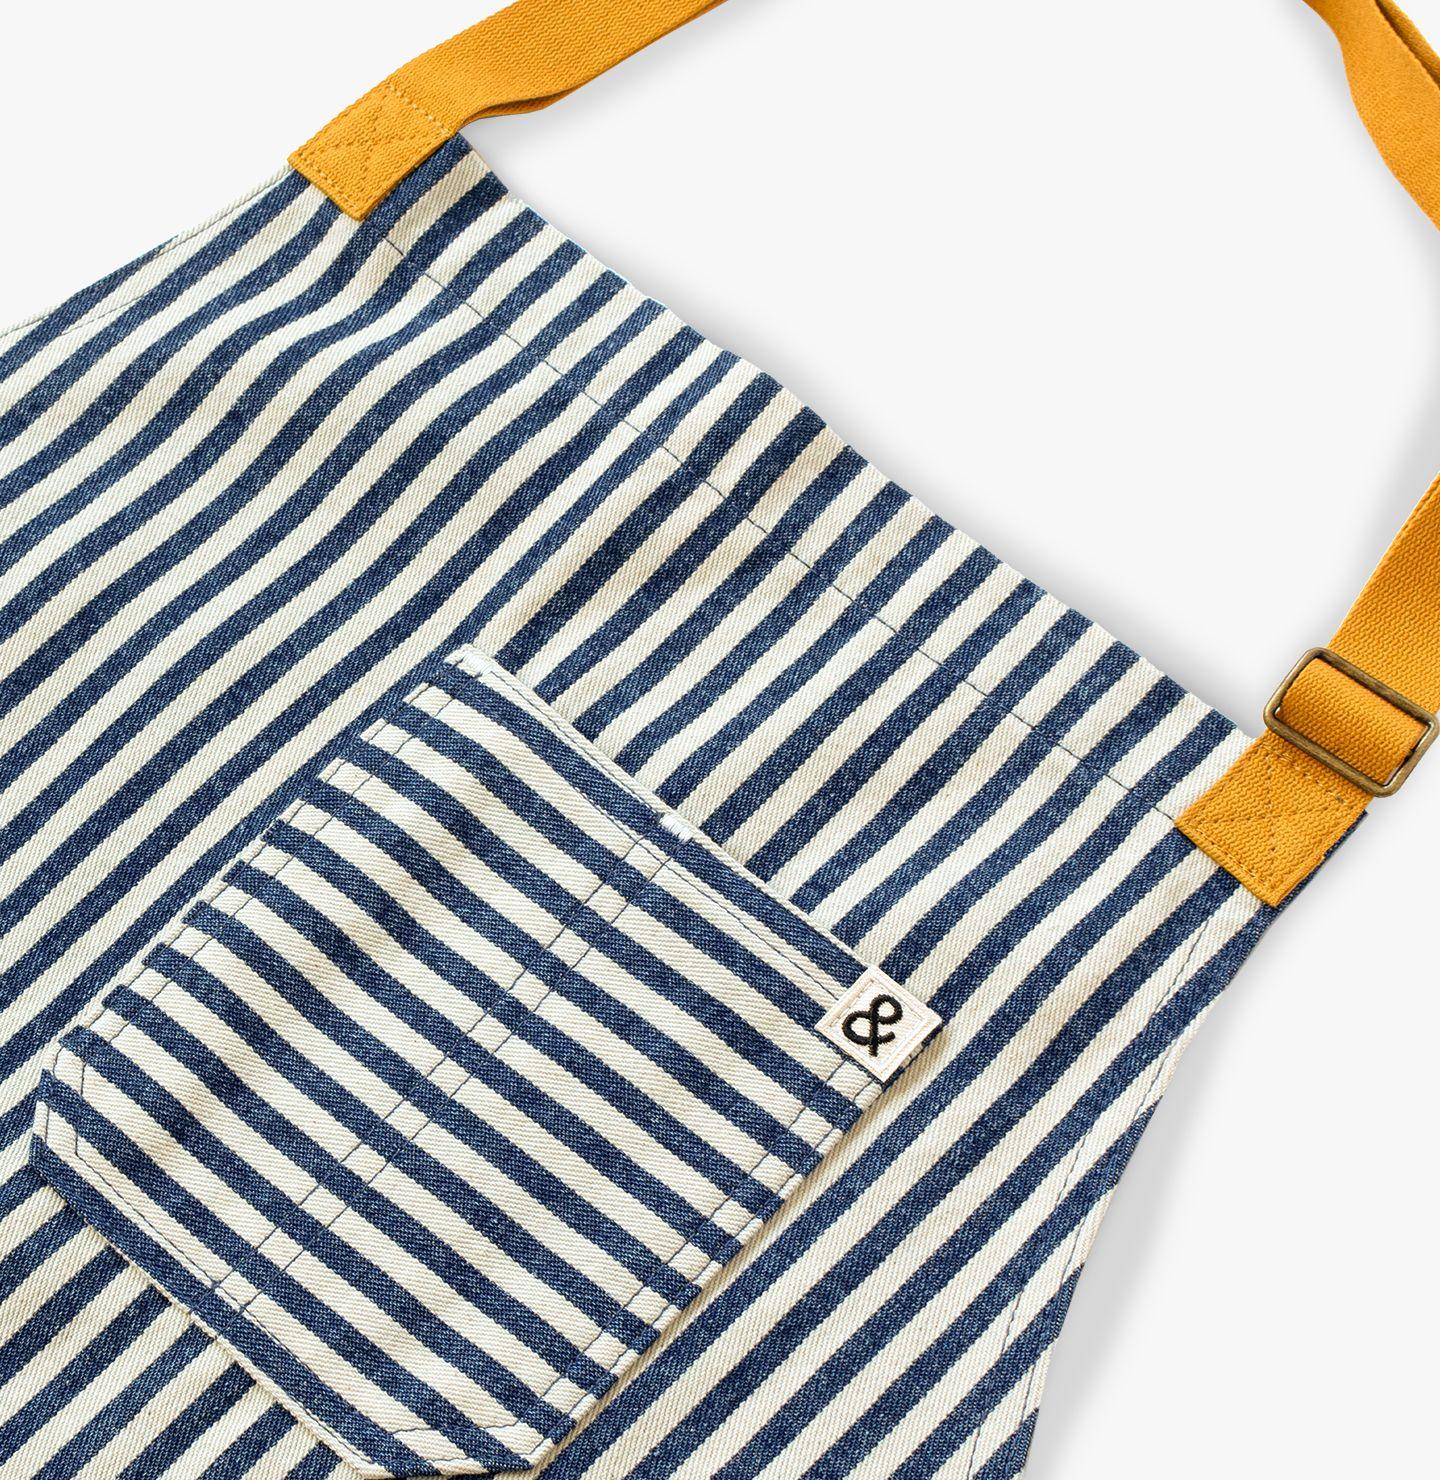 Limited Edition Fabrics